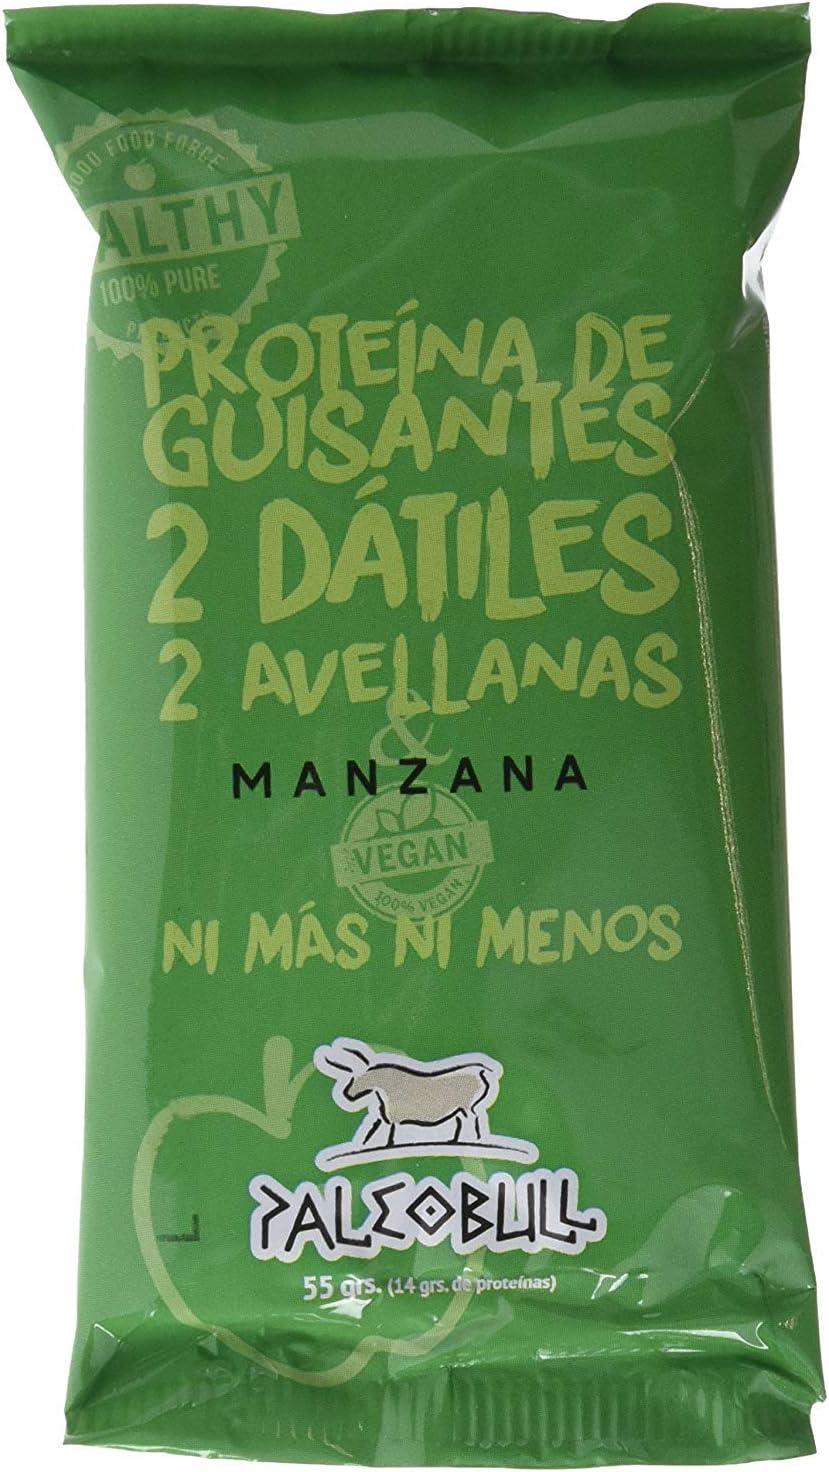 Barrita Energética Paleo 100% natural - Alta en proteínas - Manzana Vegana (55g)